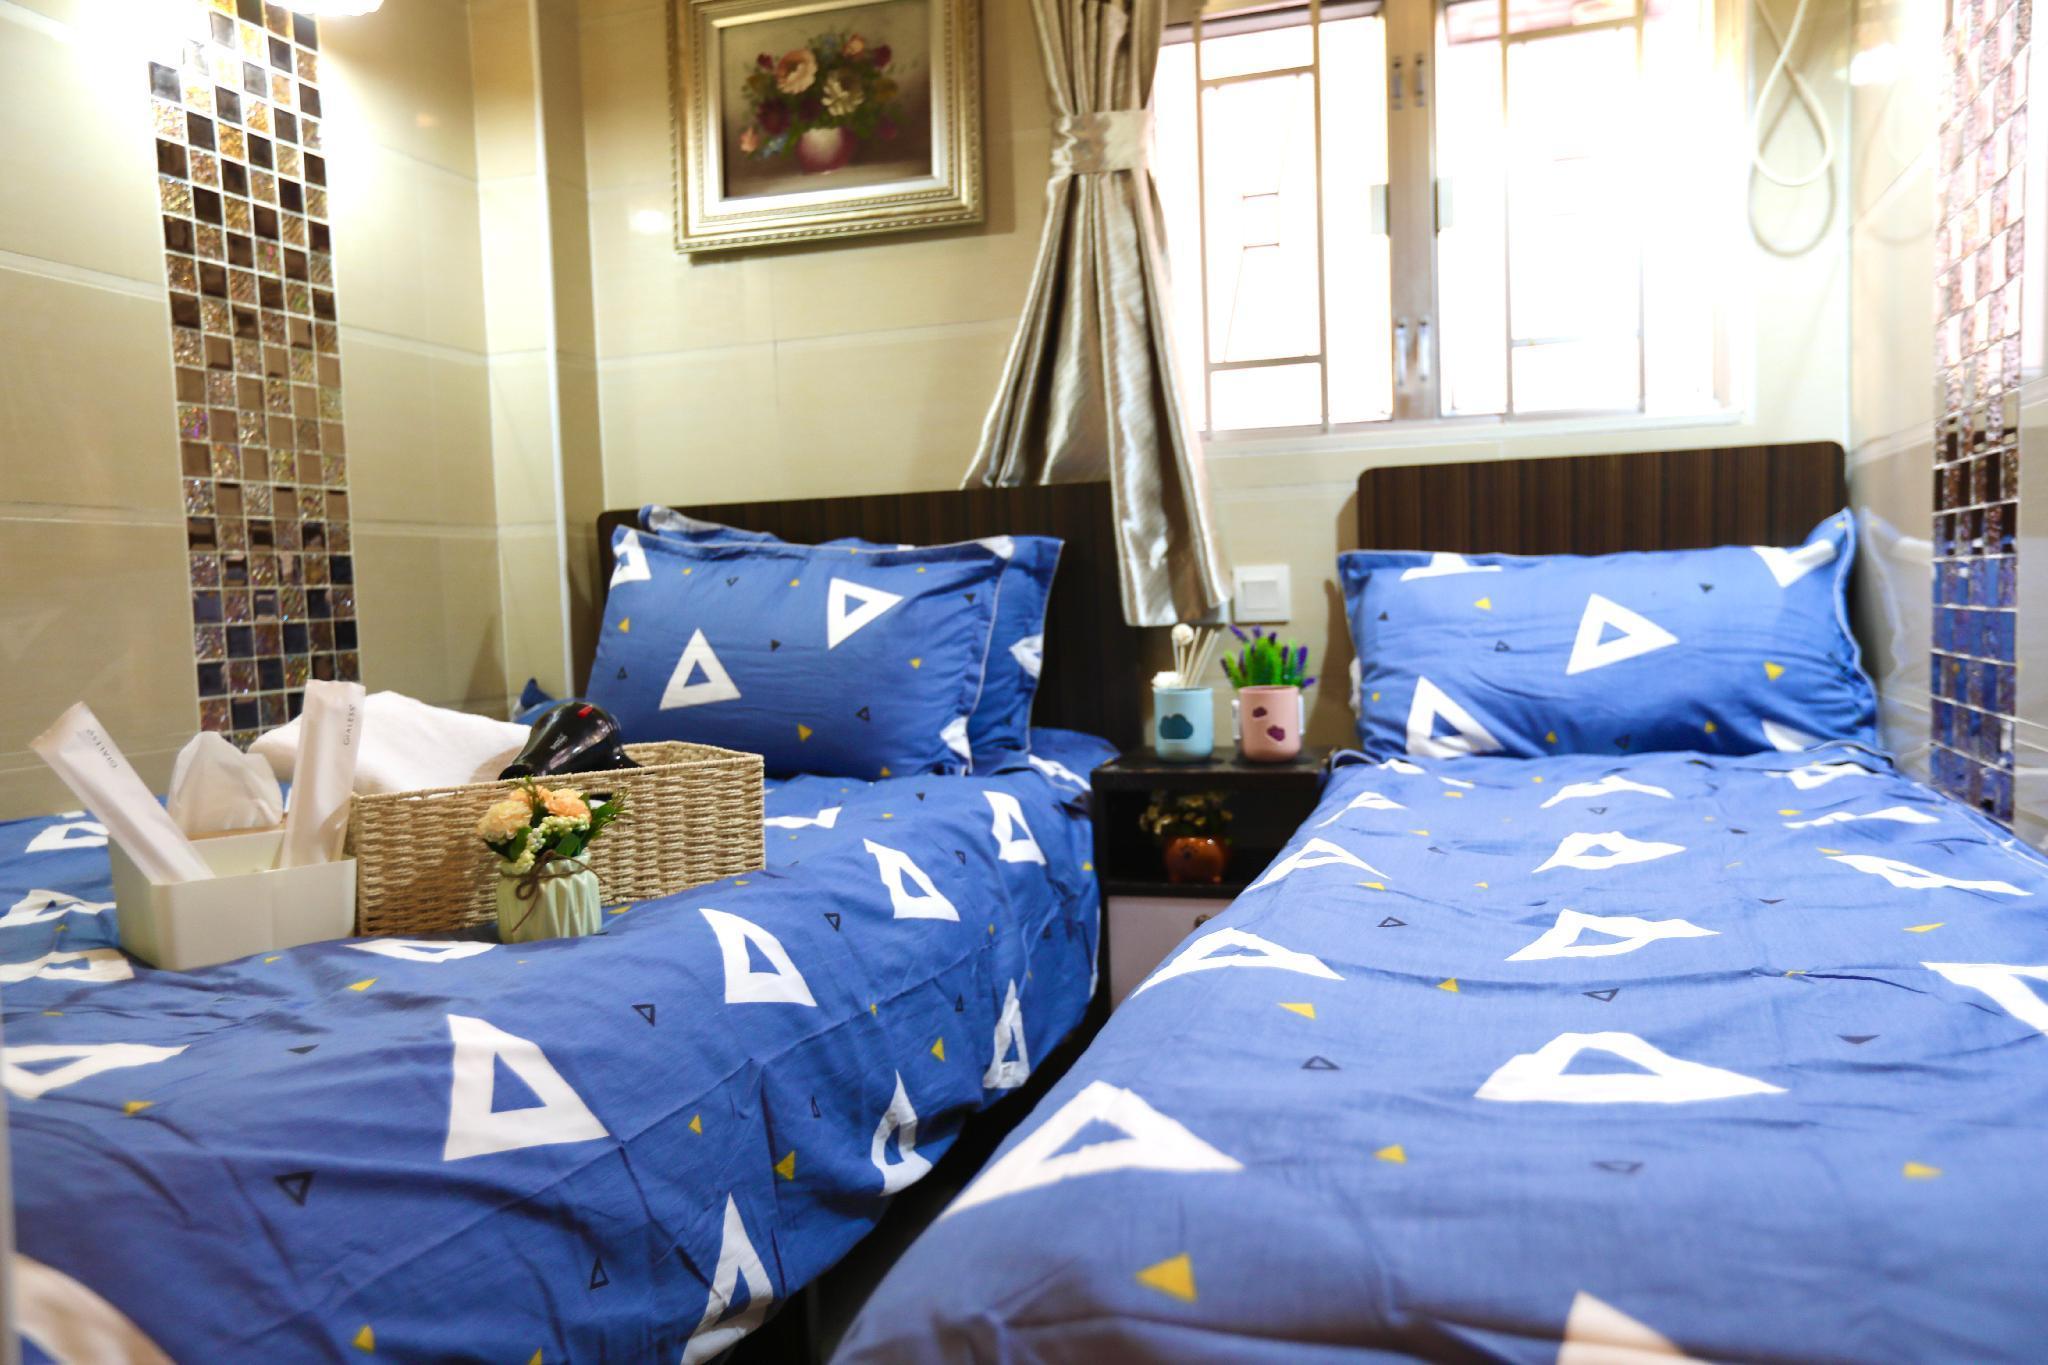 #7 Tsim Sha Tsui 1 min MTR, Twin Bed for 3 PAX